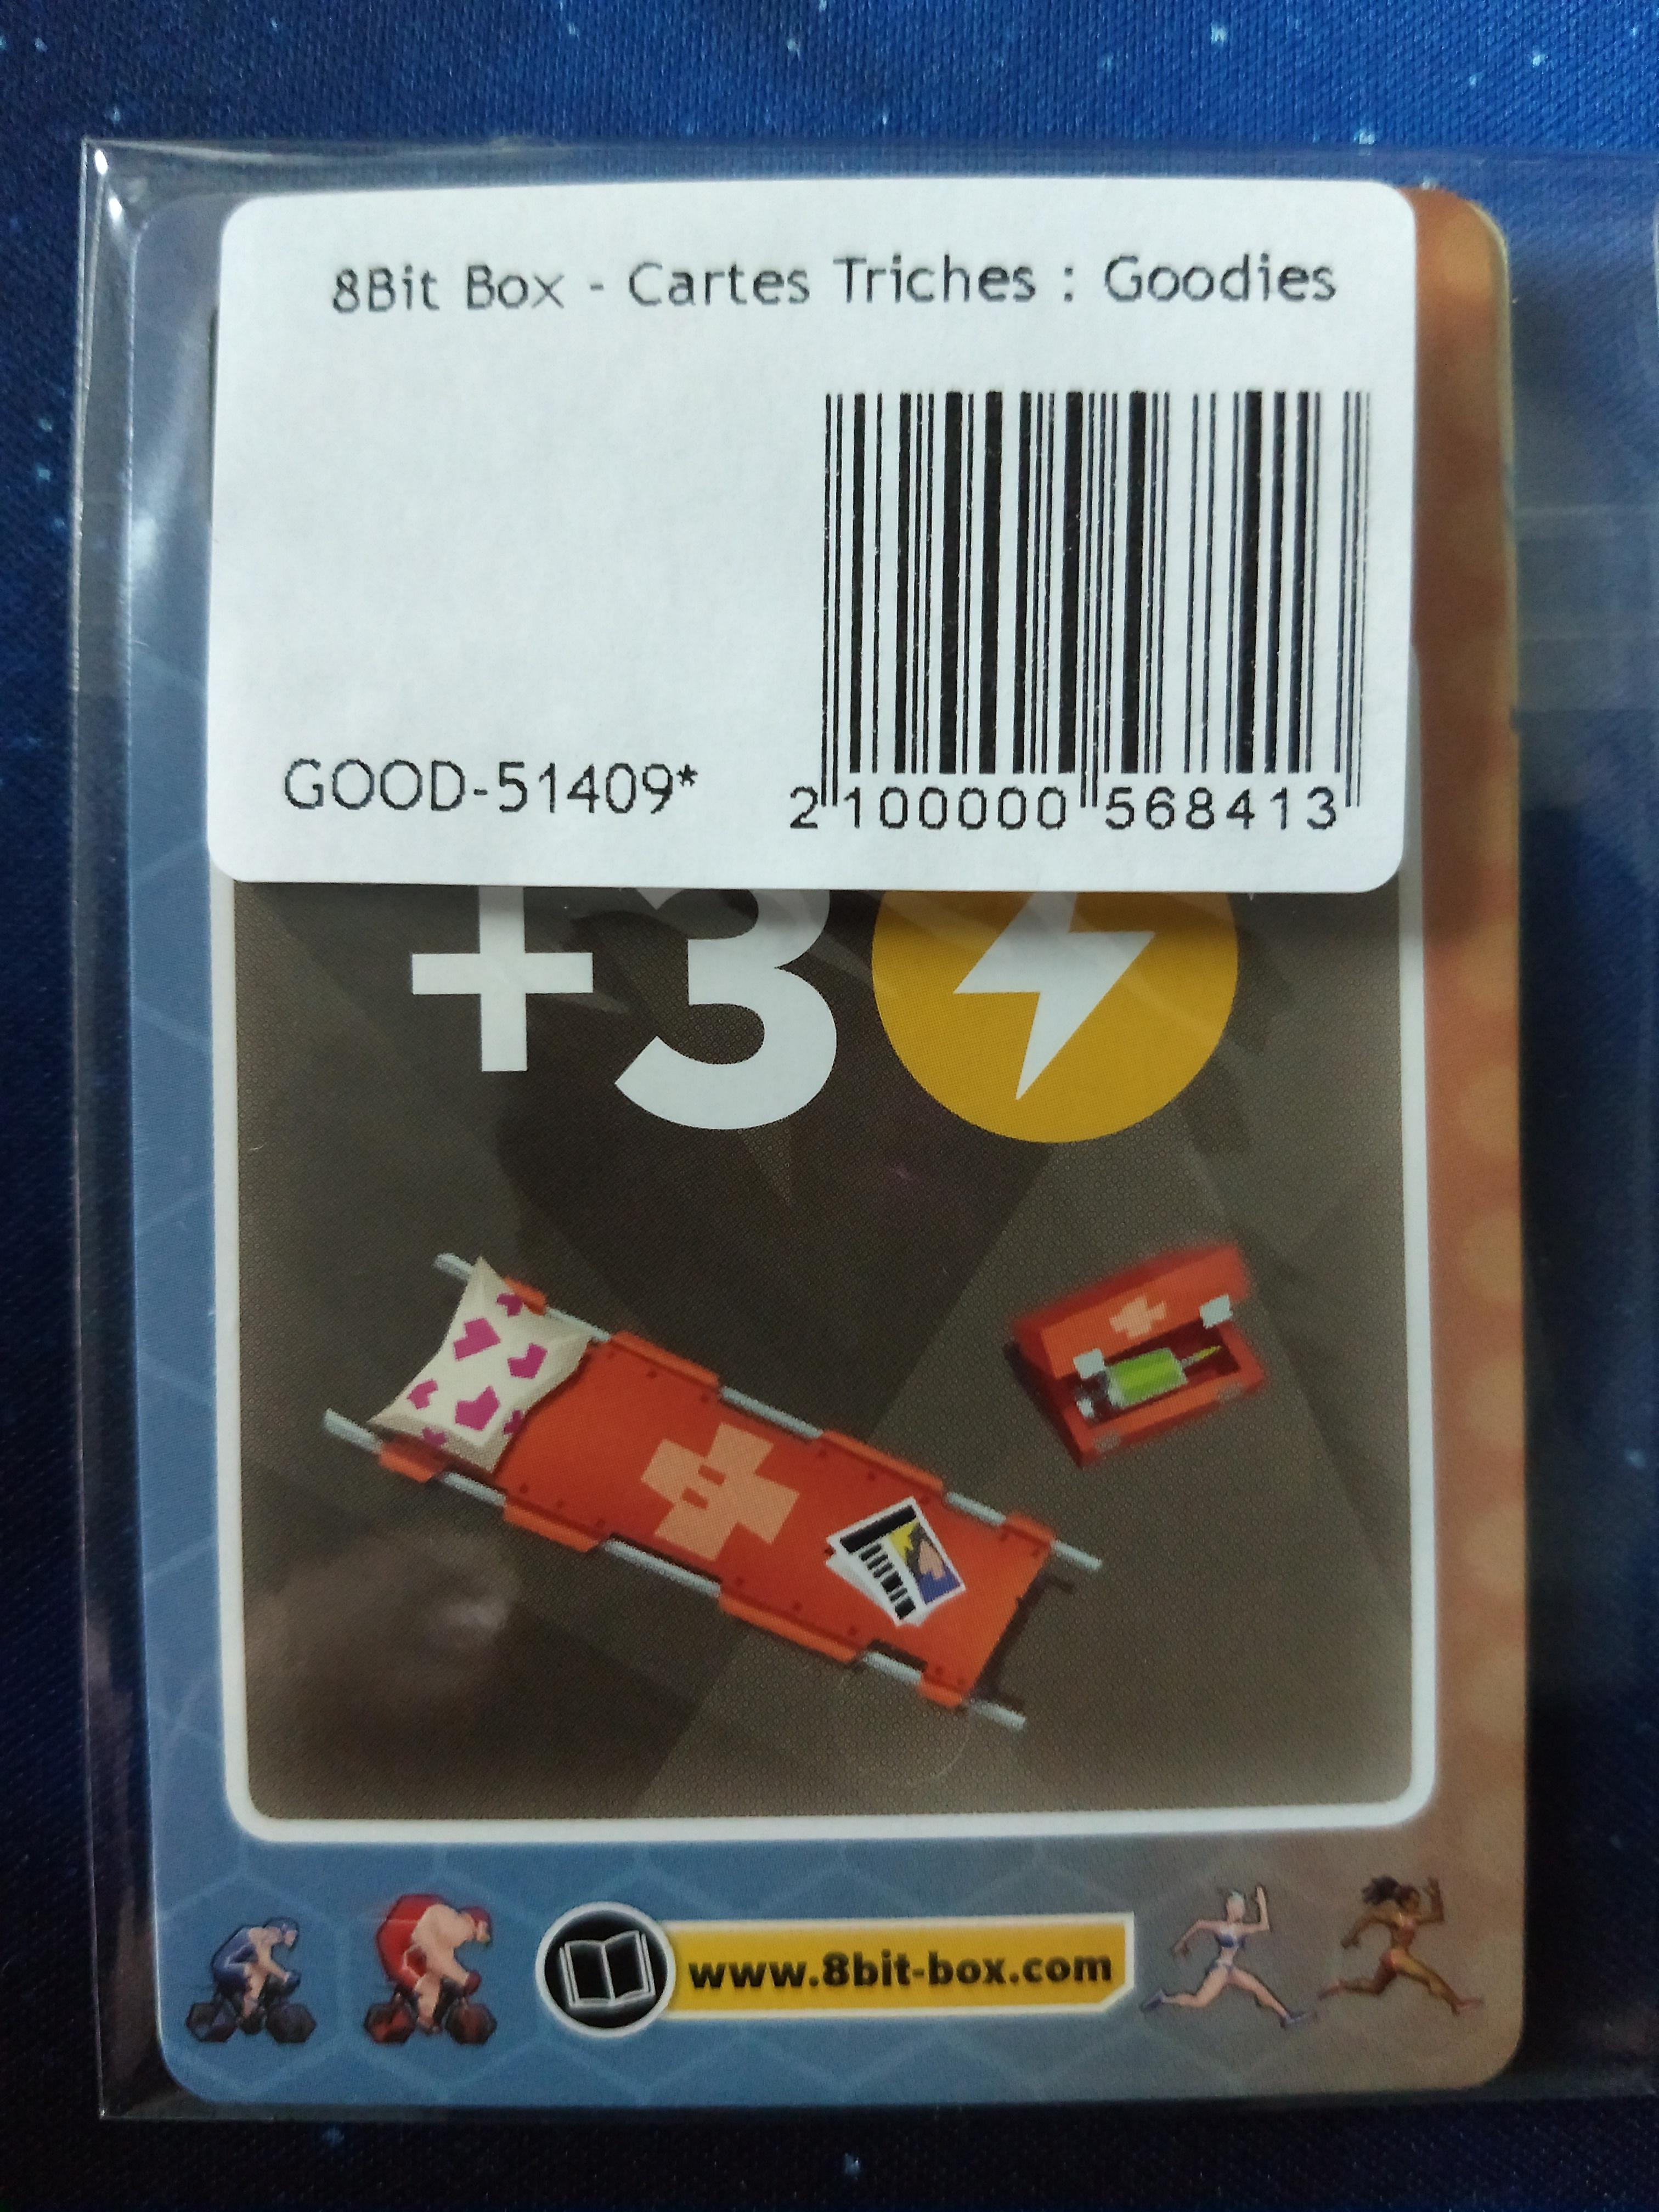 8Bit Box : Cartes triches Goodies